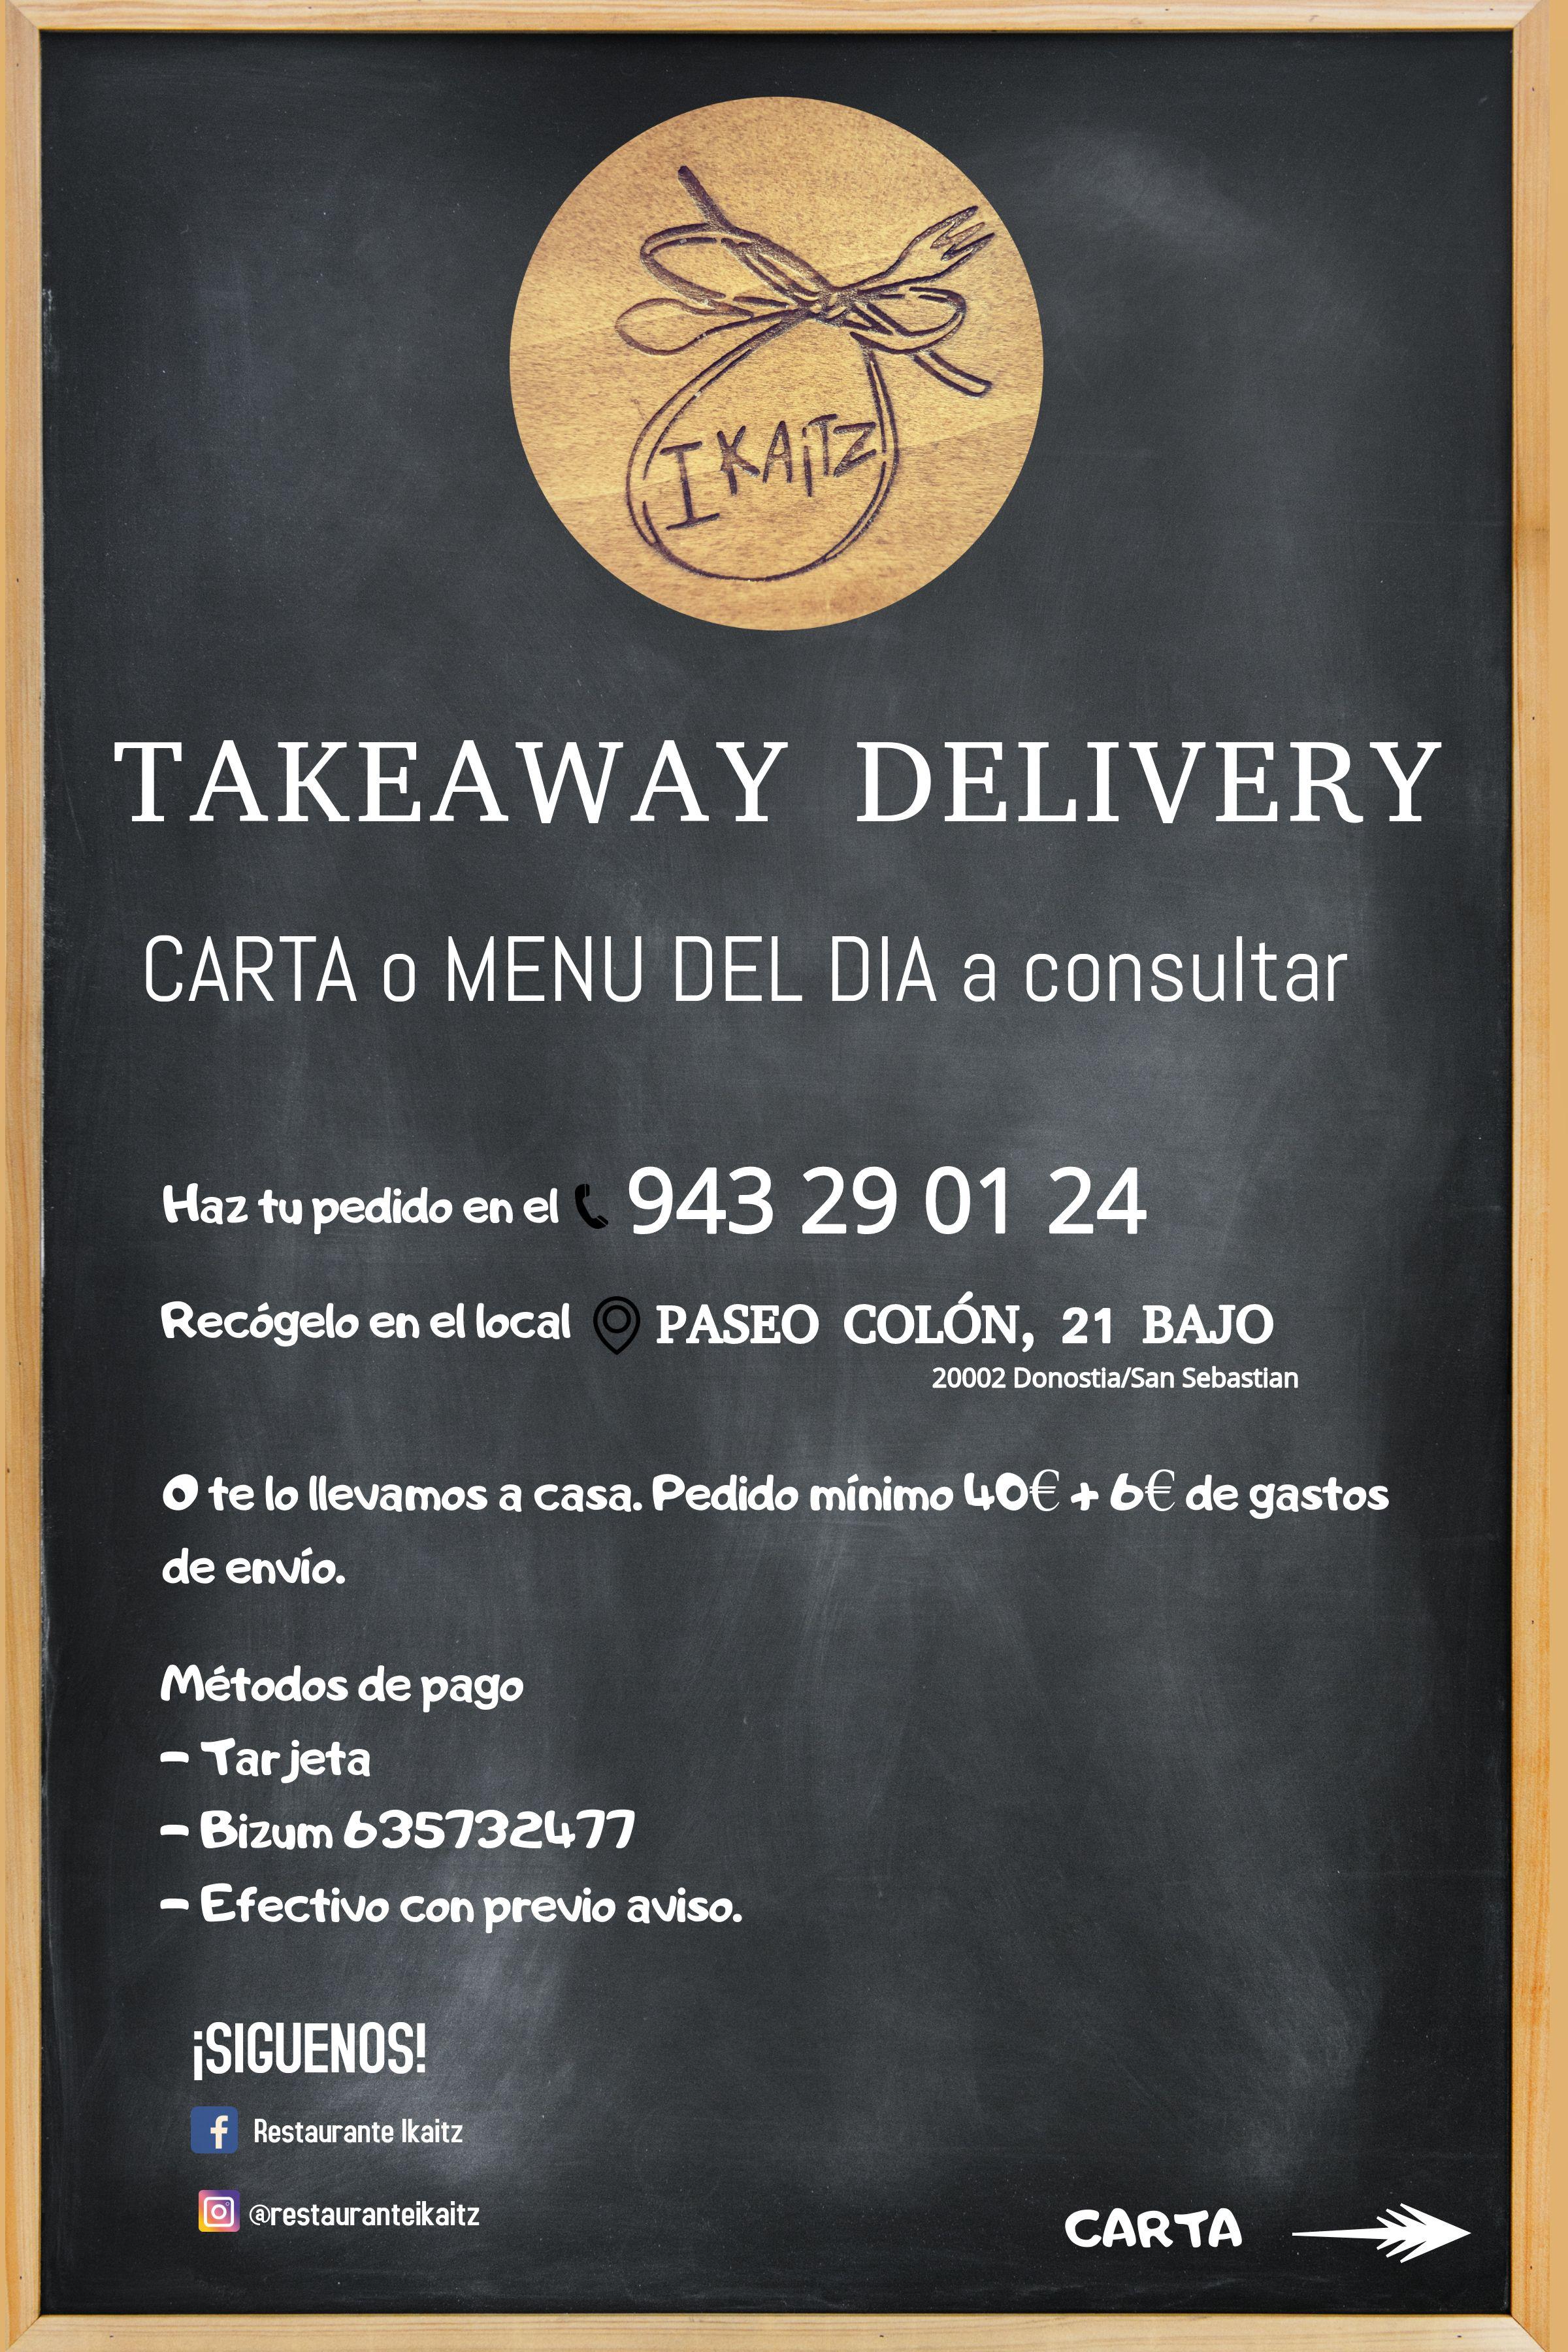 Presentacion Take Away - Restaurante Ikaitz